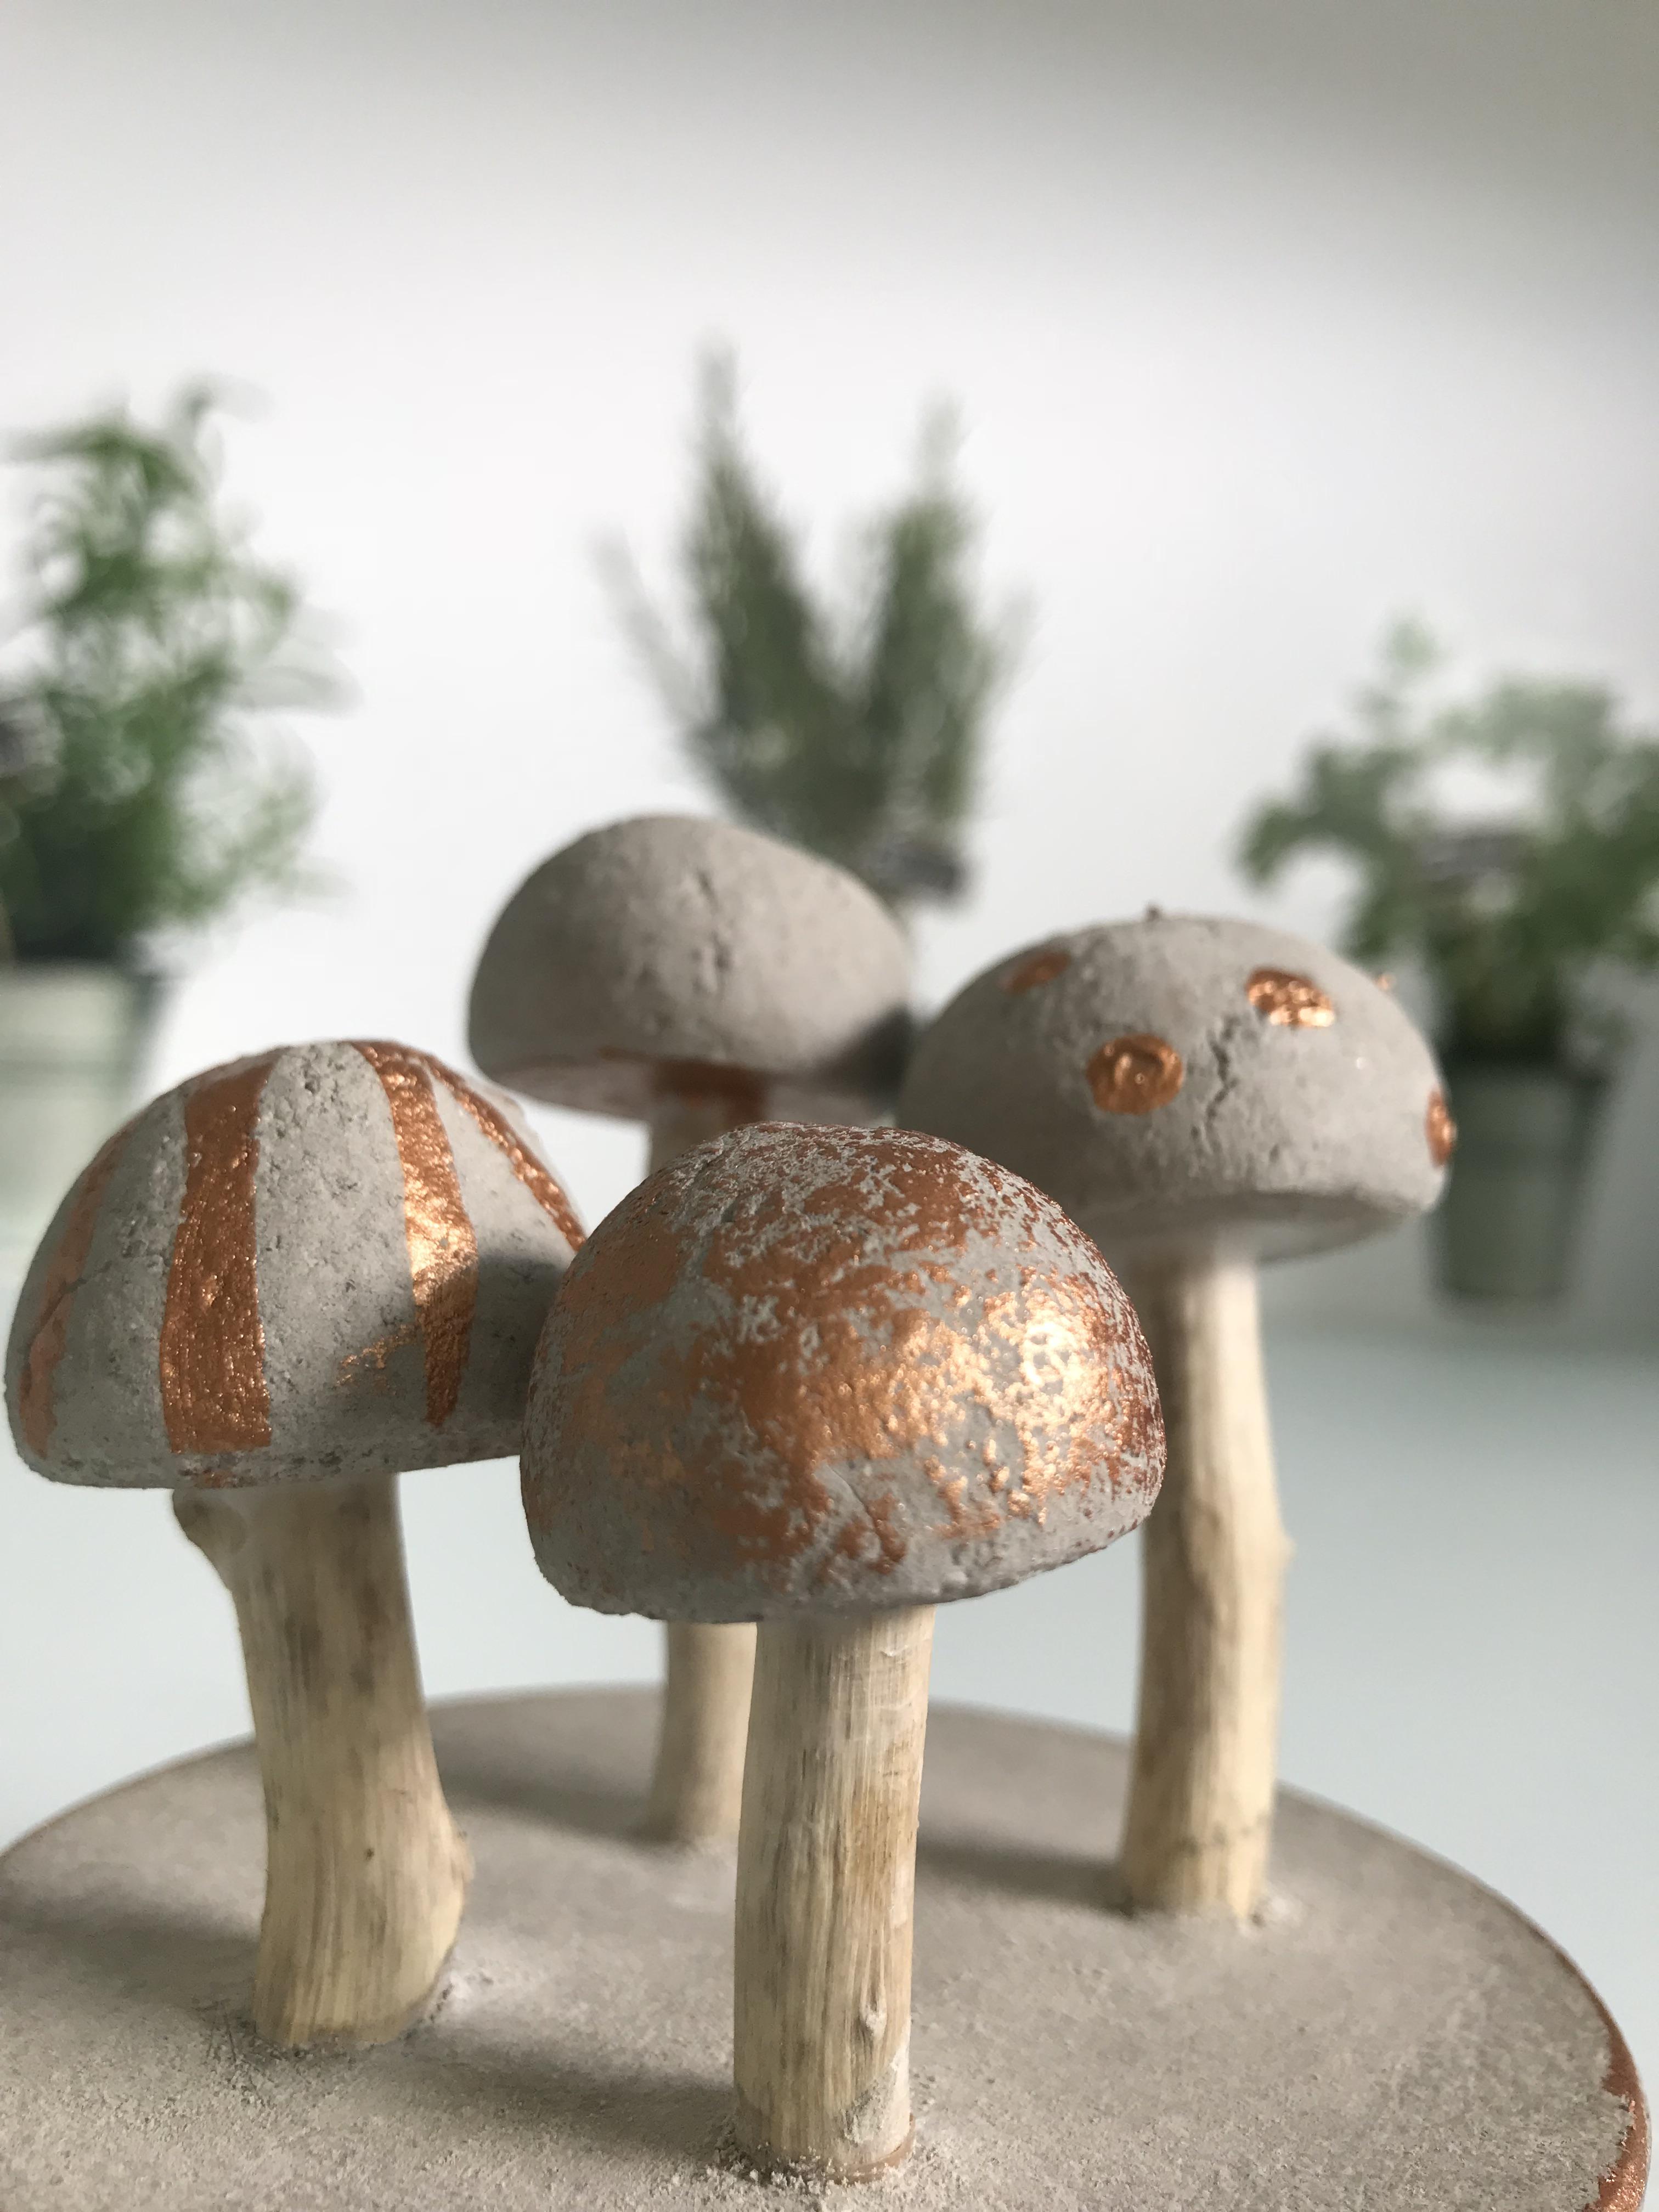 DIY: Beton Pilze basteln, Tolle Deko aus Kneteton selber machen. #Chalet8, #Beton